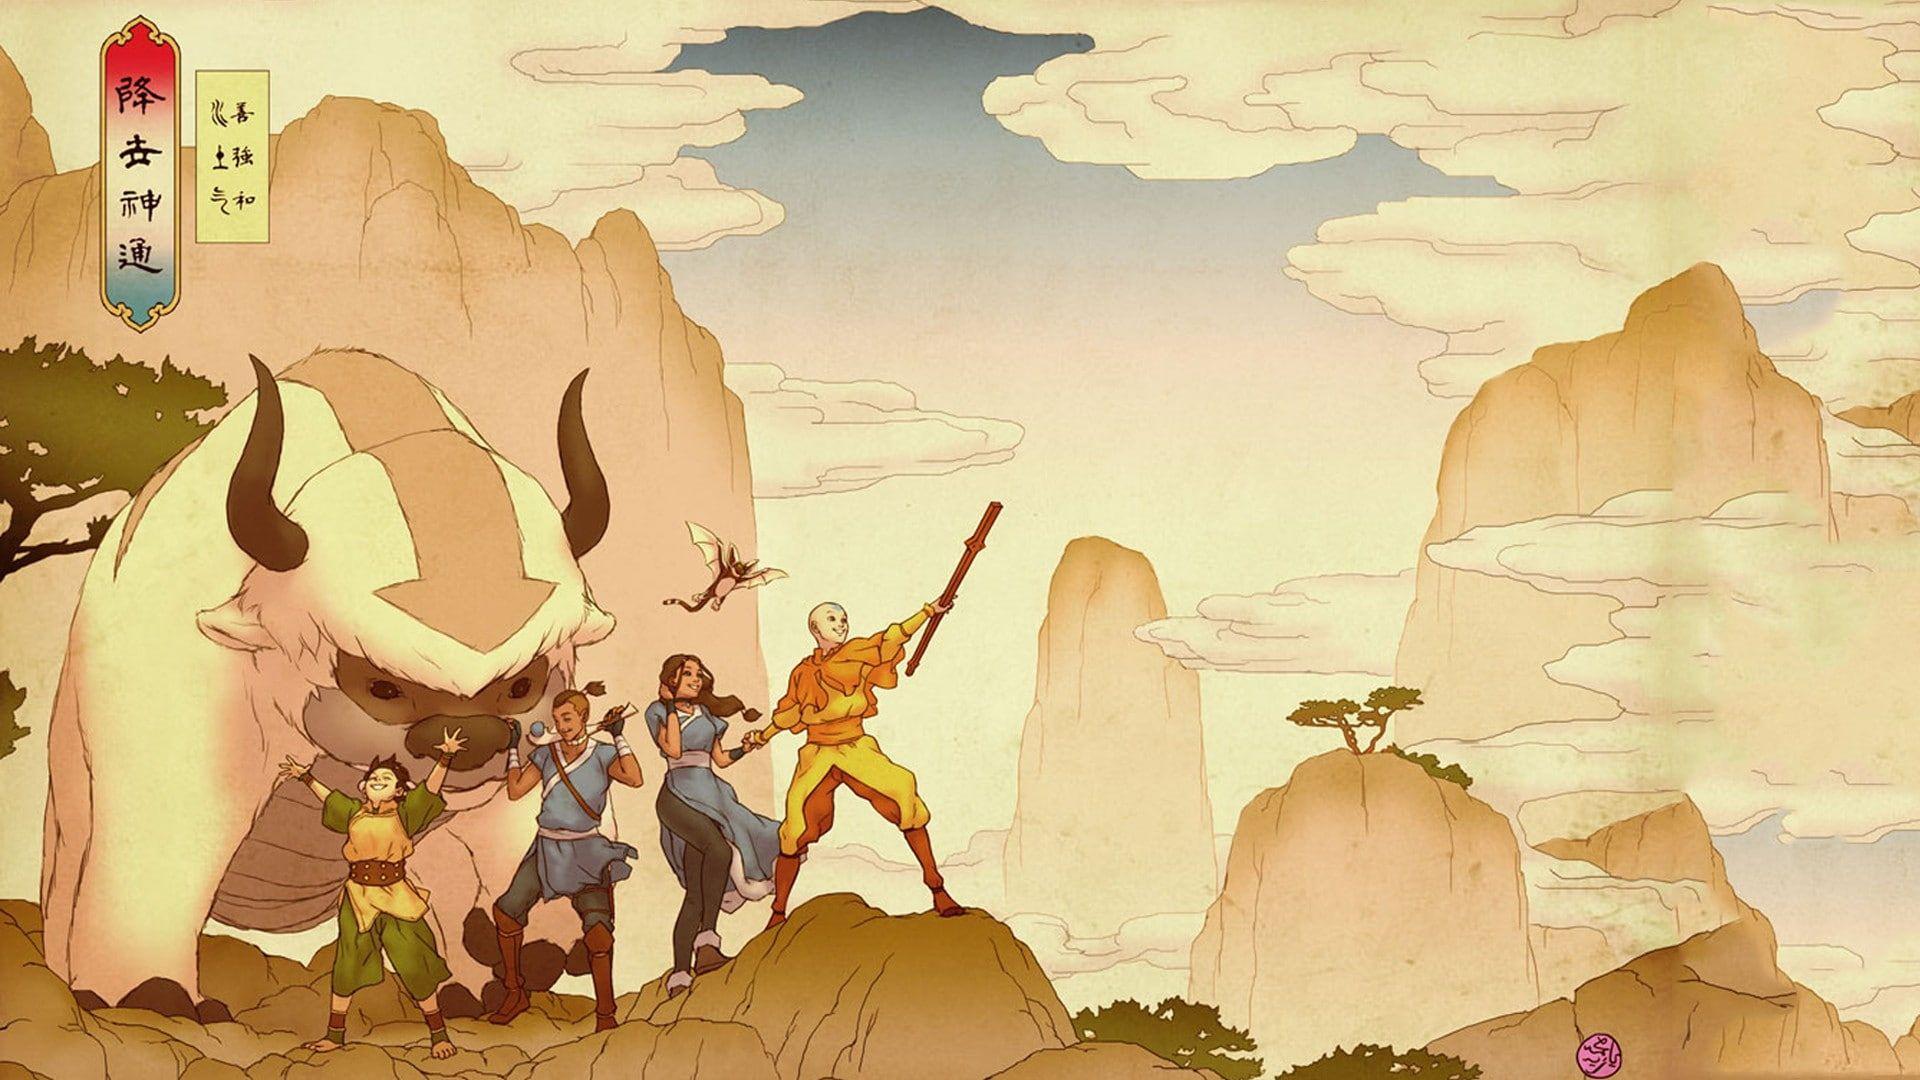 Avatar The Last Airbender 1080p Wallpaper Hdwallpaper Desktop Avatar Airbender Avatar Aang The Last Airbender